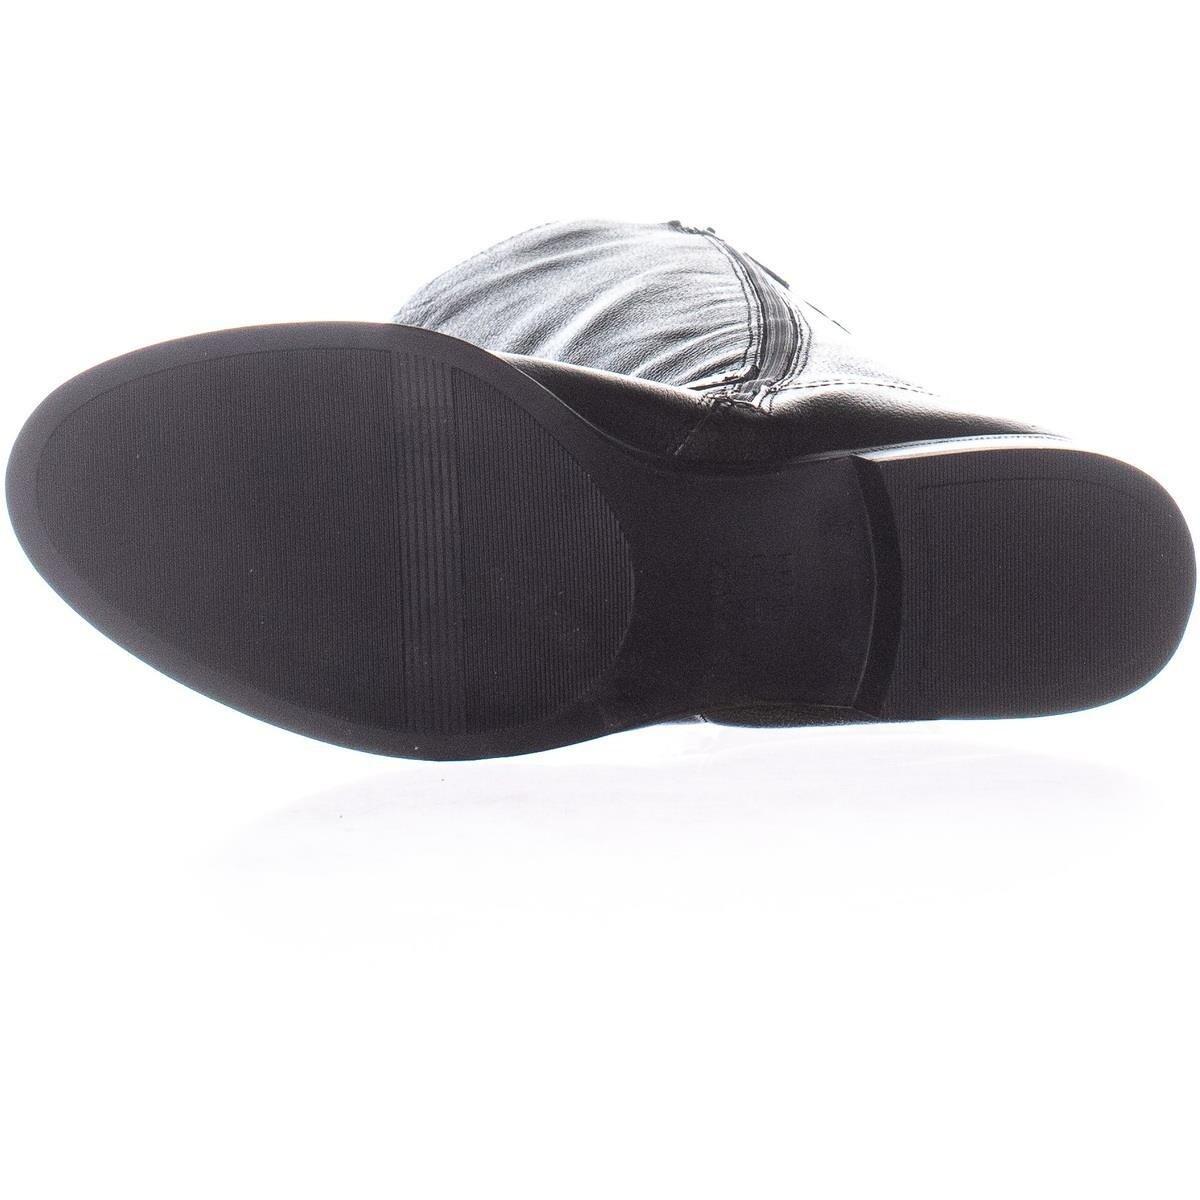 7f58f9a4987 Shop naturalizer Jillian Wide Calf Knee High Boots